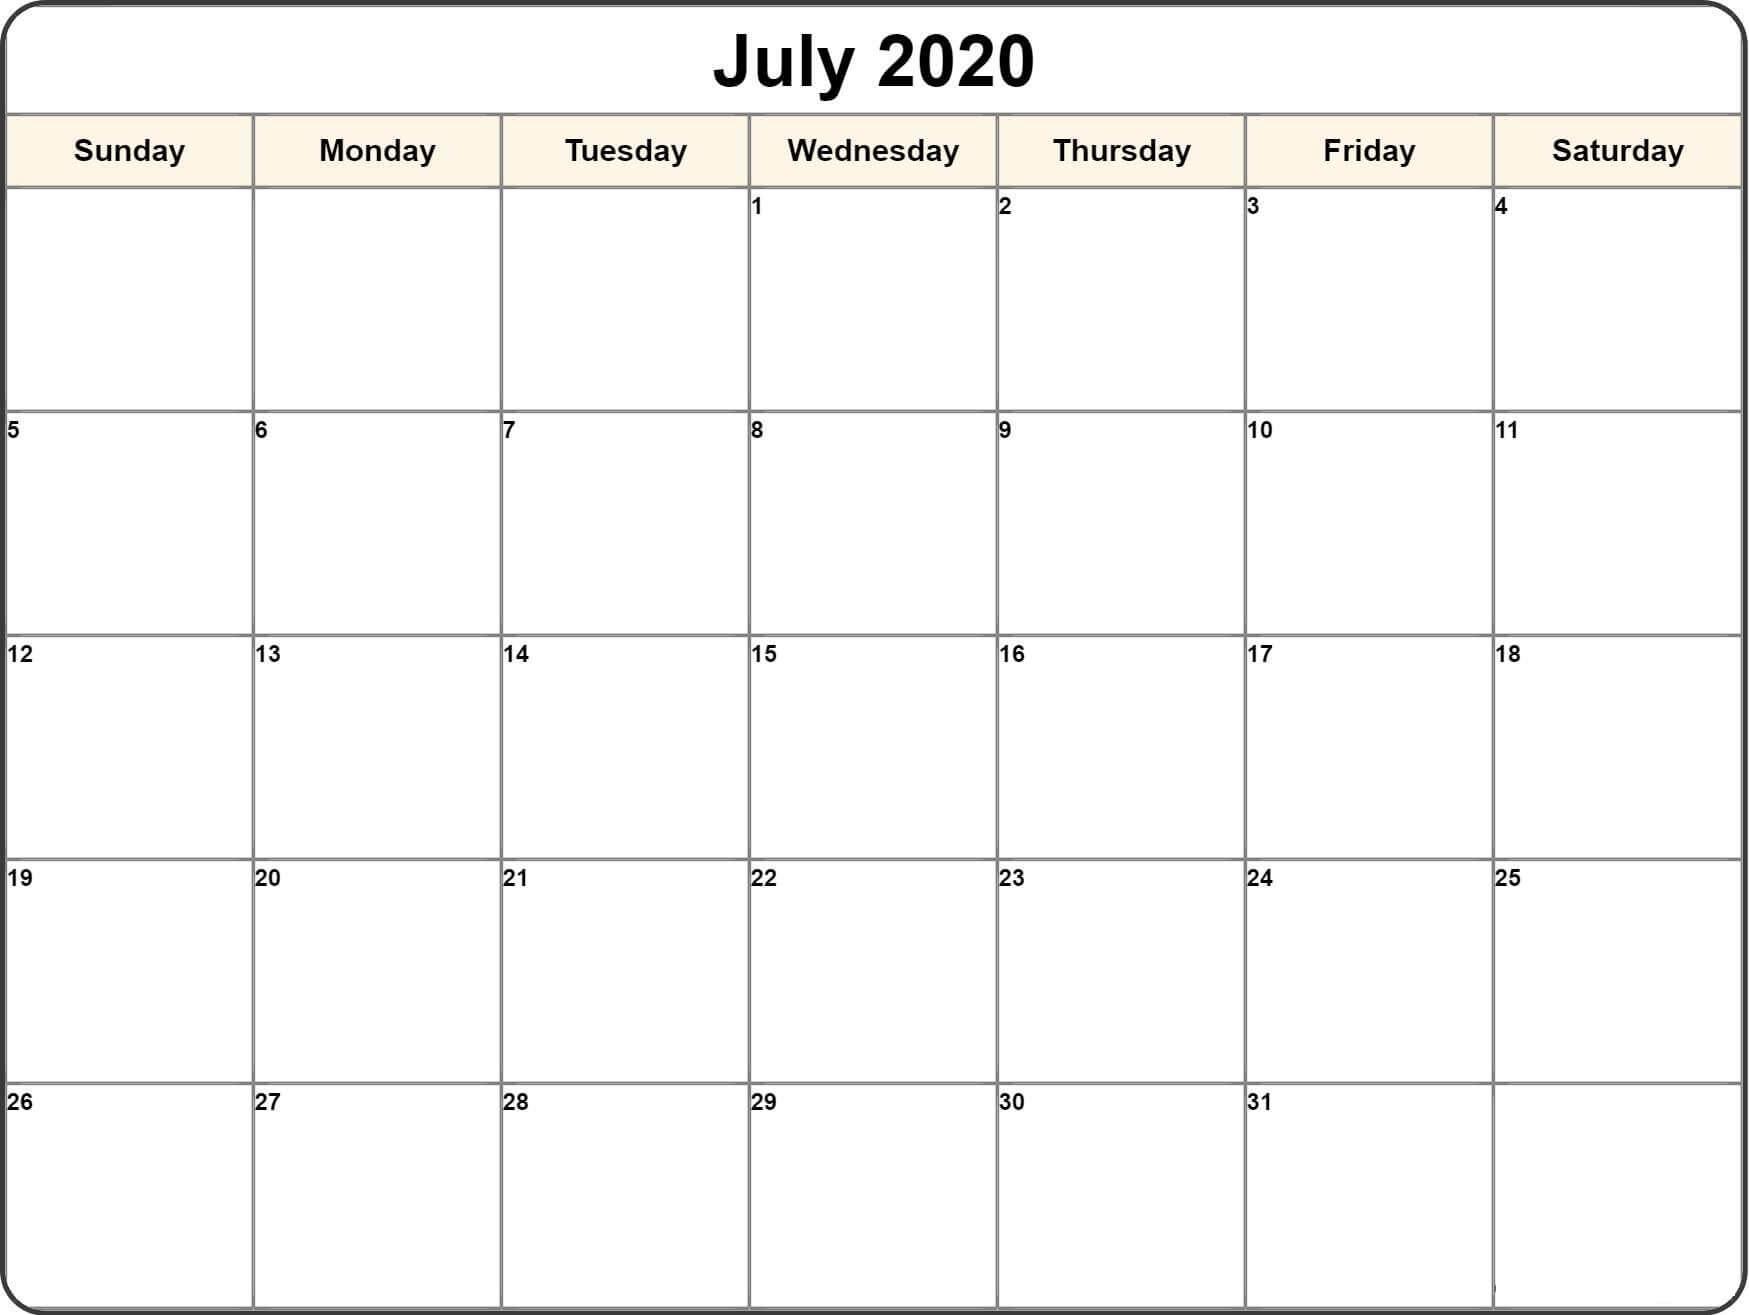 July 2020 Calendar Holidays